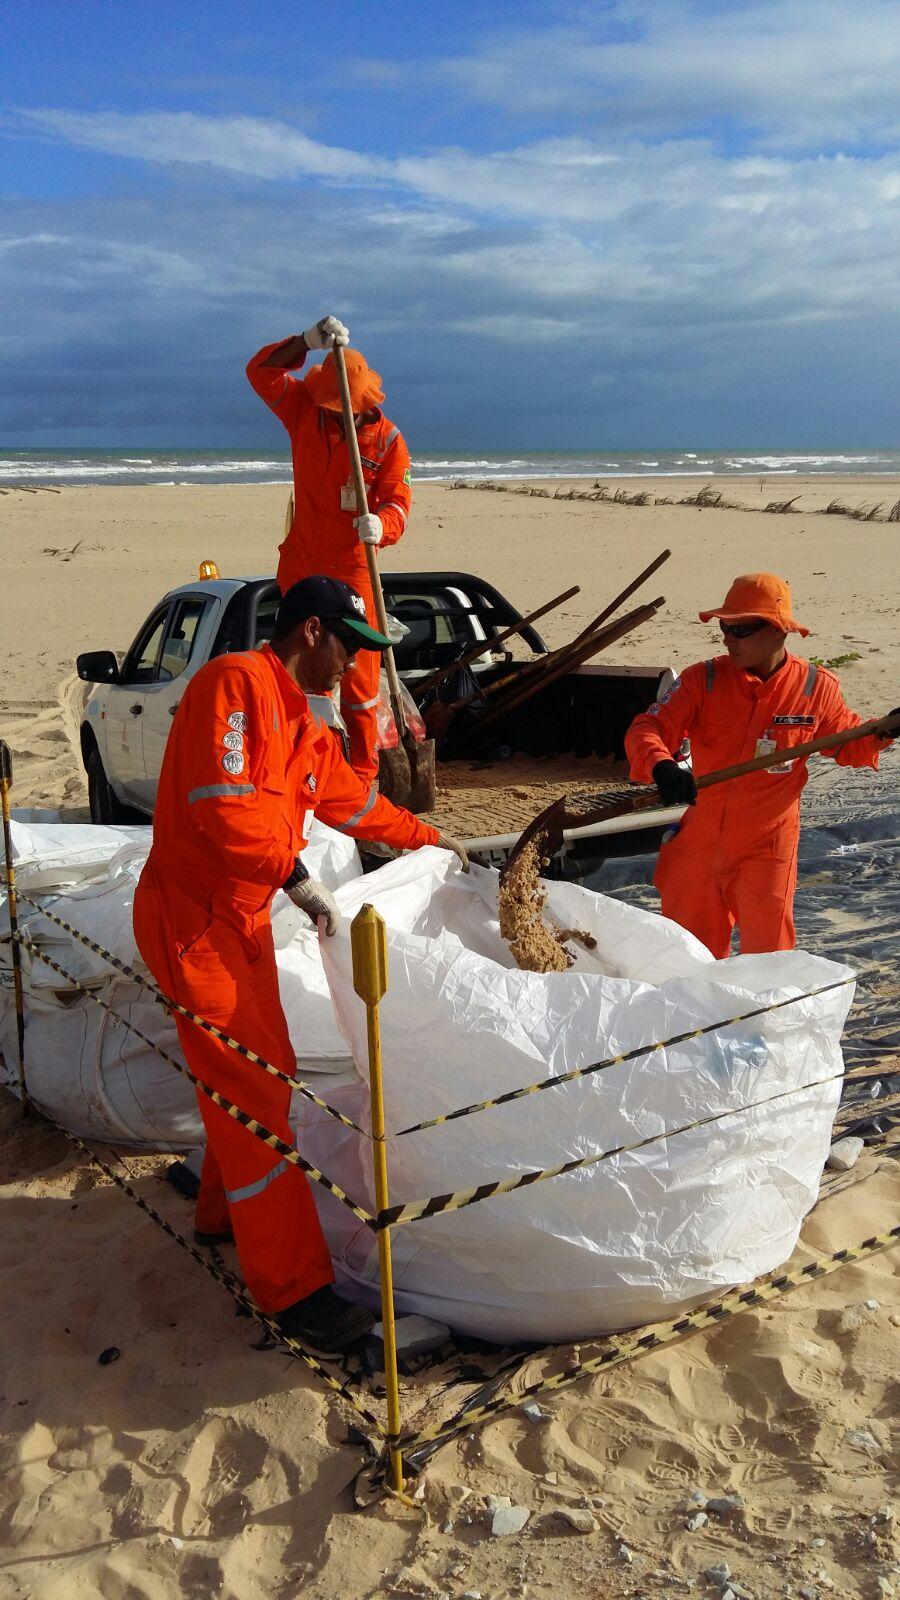 Derramamento de óleo atinge praias de Pirambu